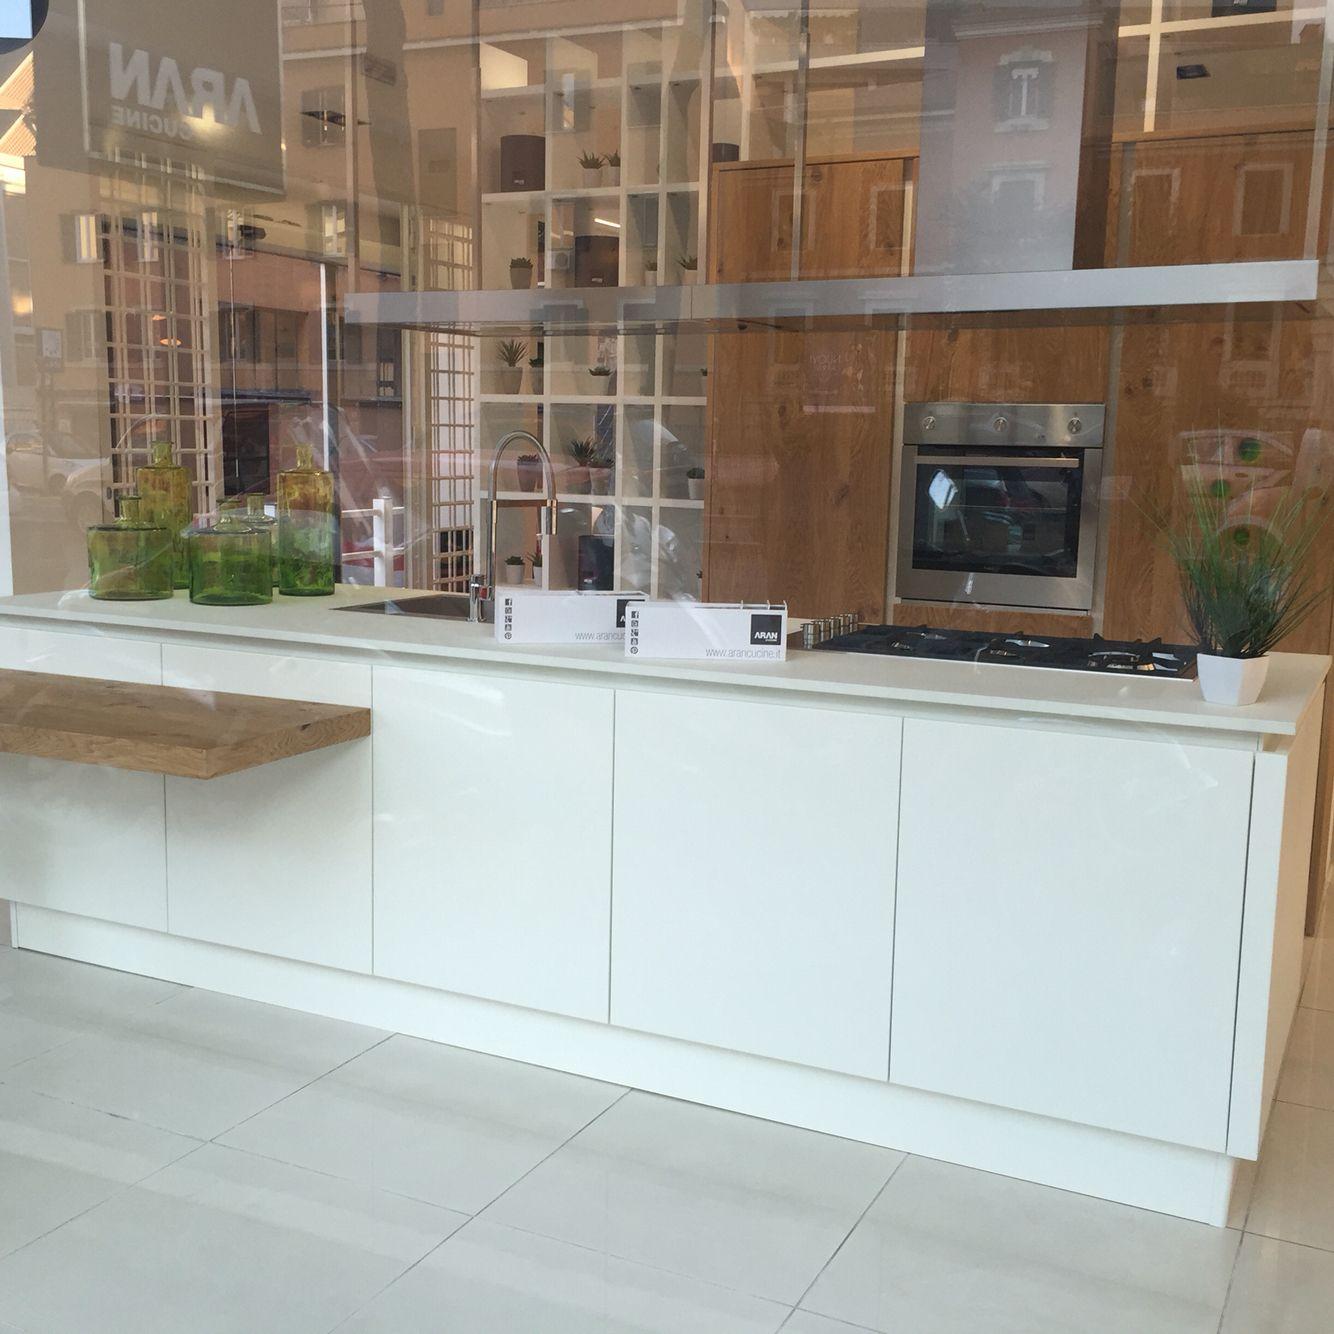 Erfreut Küche Designtrends Zu Vermeiden Fotos - Küche Set Ideen ...